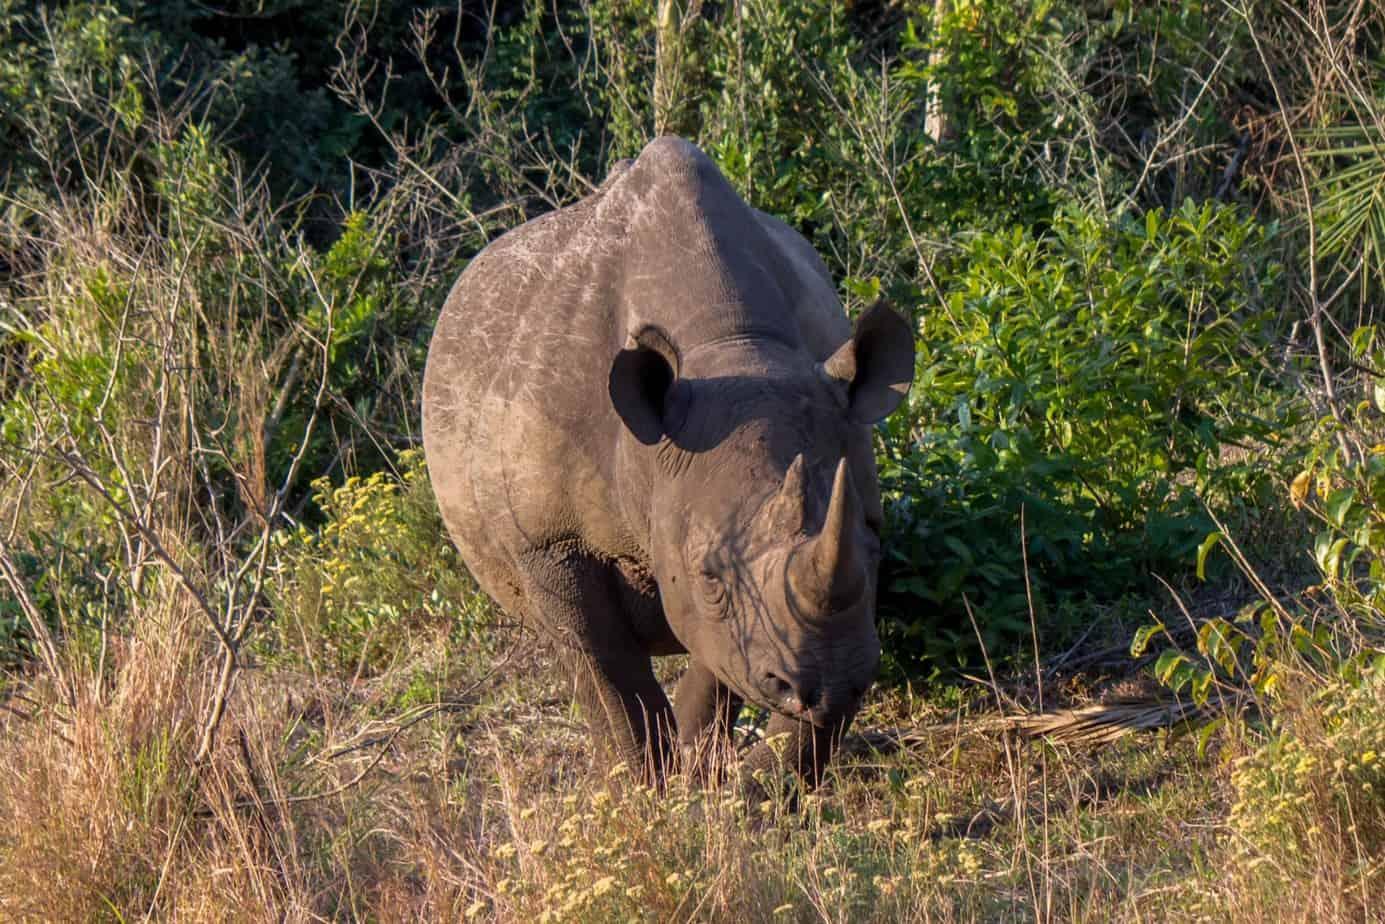 Black Rhinoceros @ Eastern Shores - iSimangaliso Wetland Park. Photo: Håvard Rosenlund